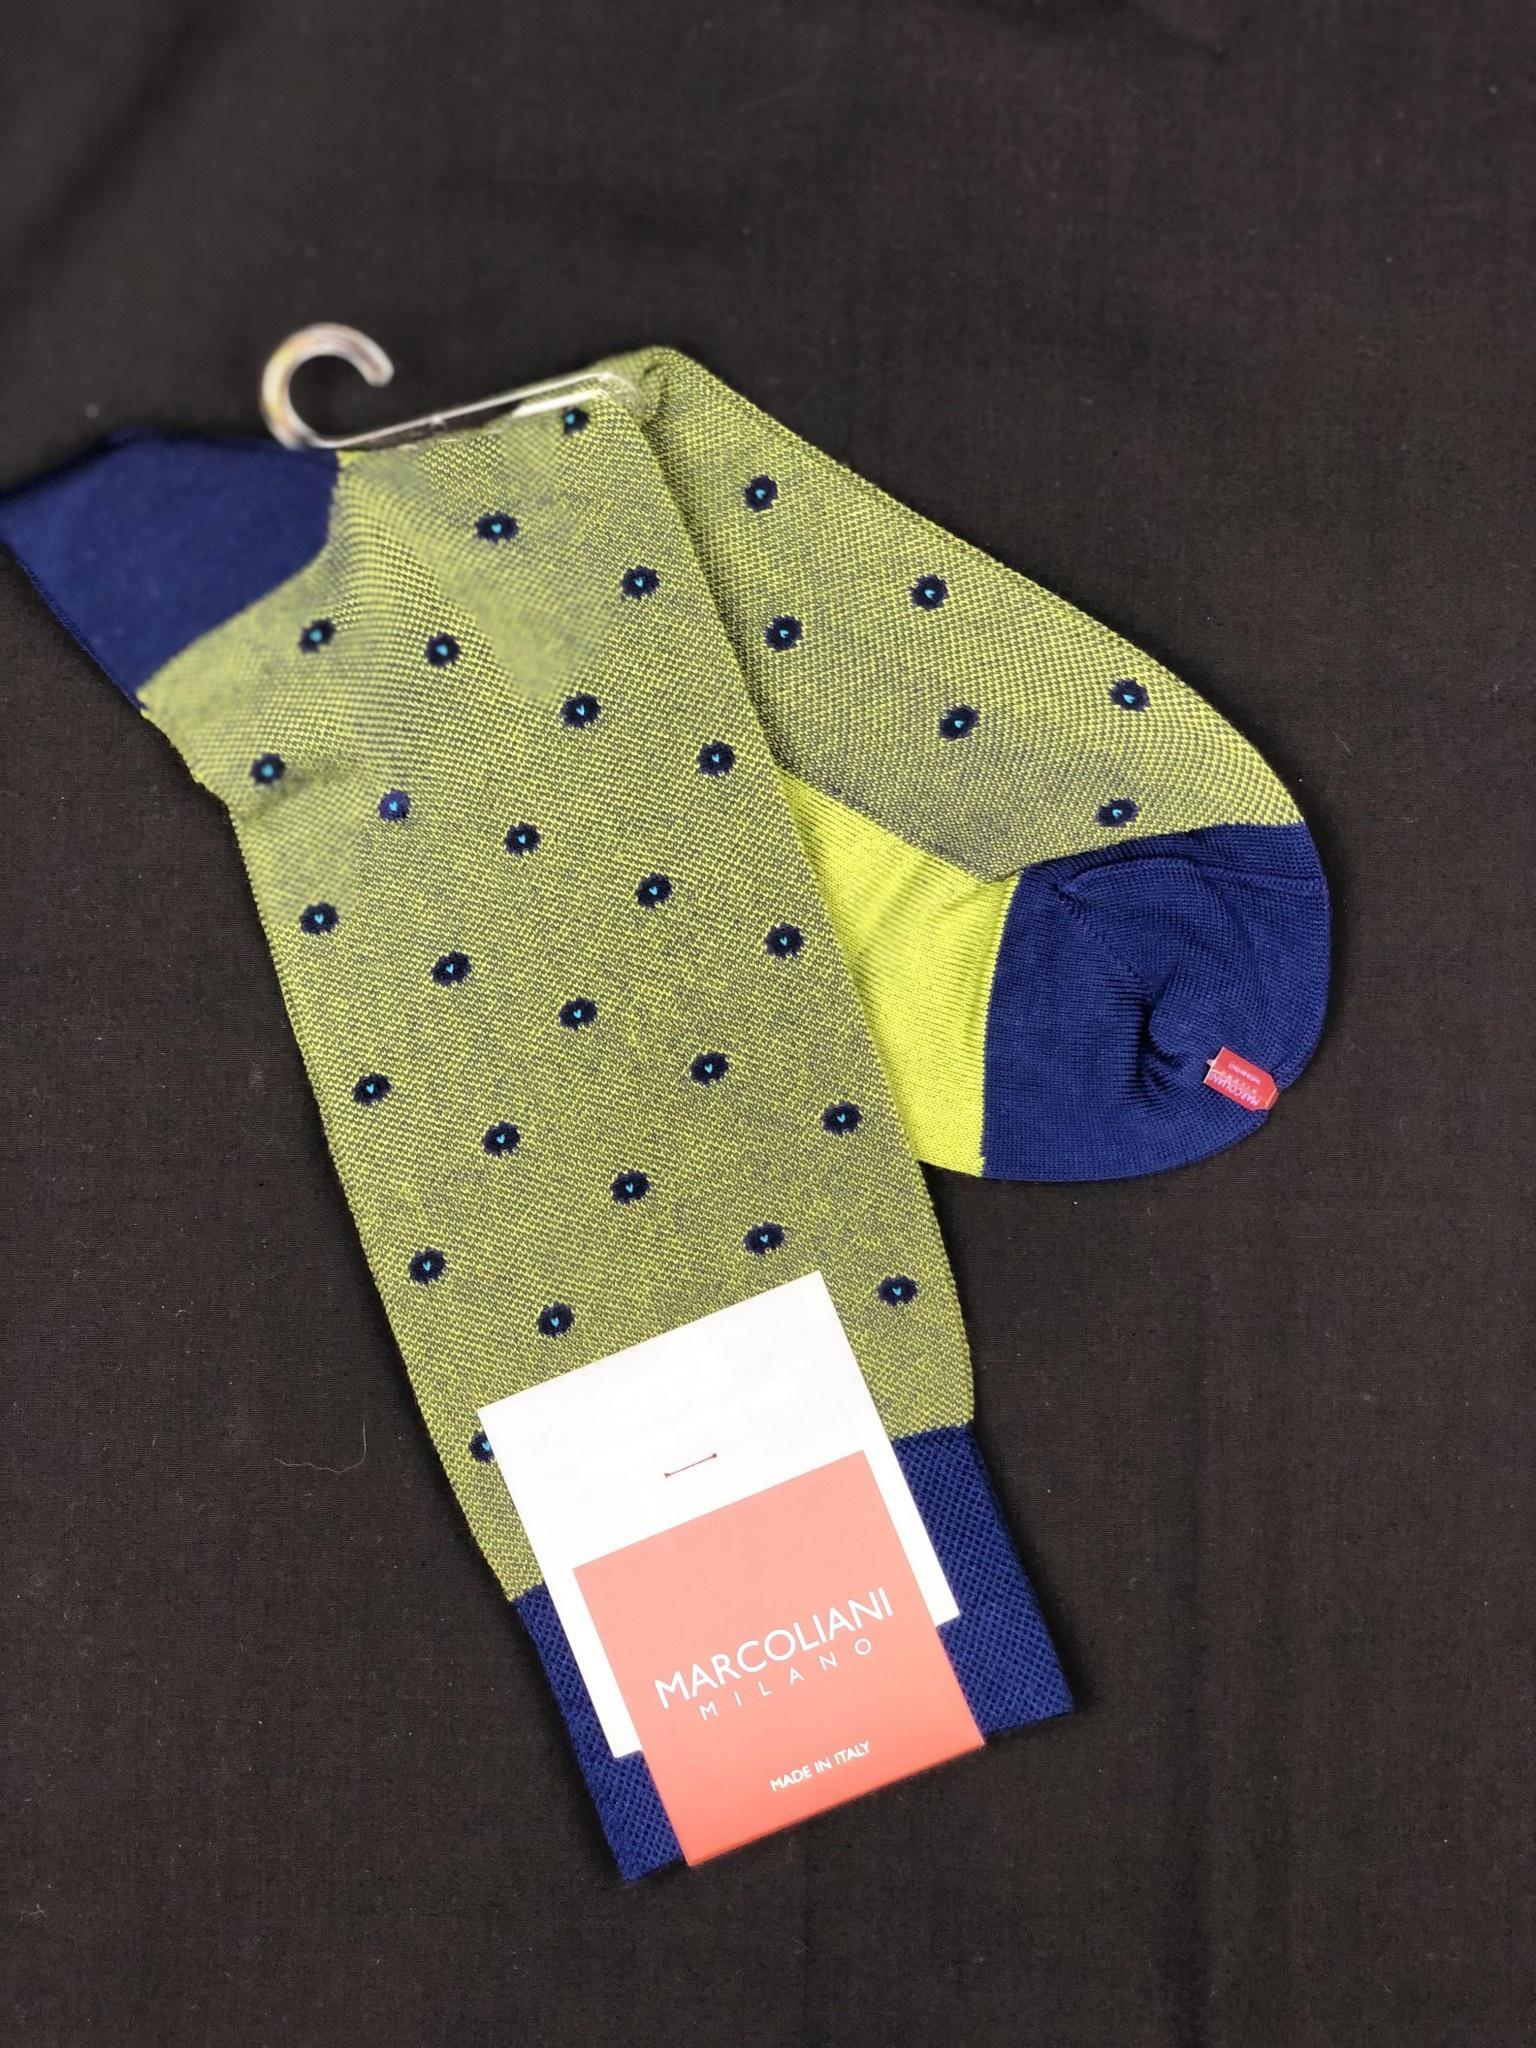 MARCOLIANI Marcoliani Mid Calf Pique Dots Elegant Style Socks MAR4355T